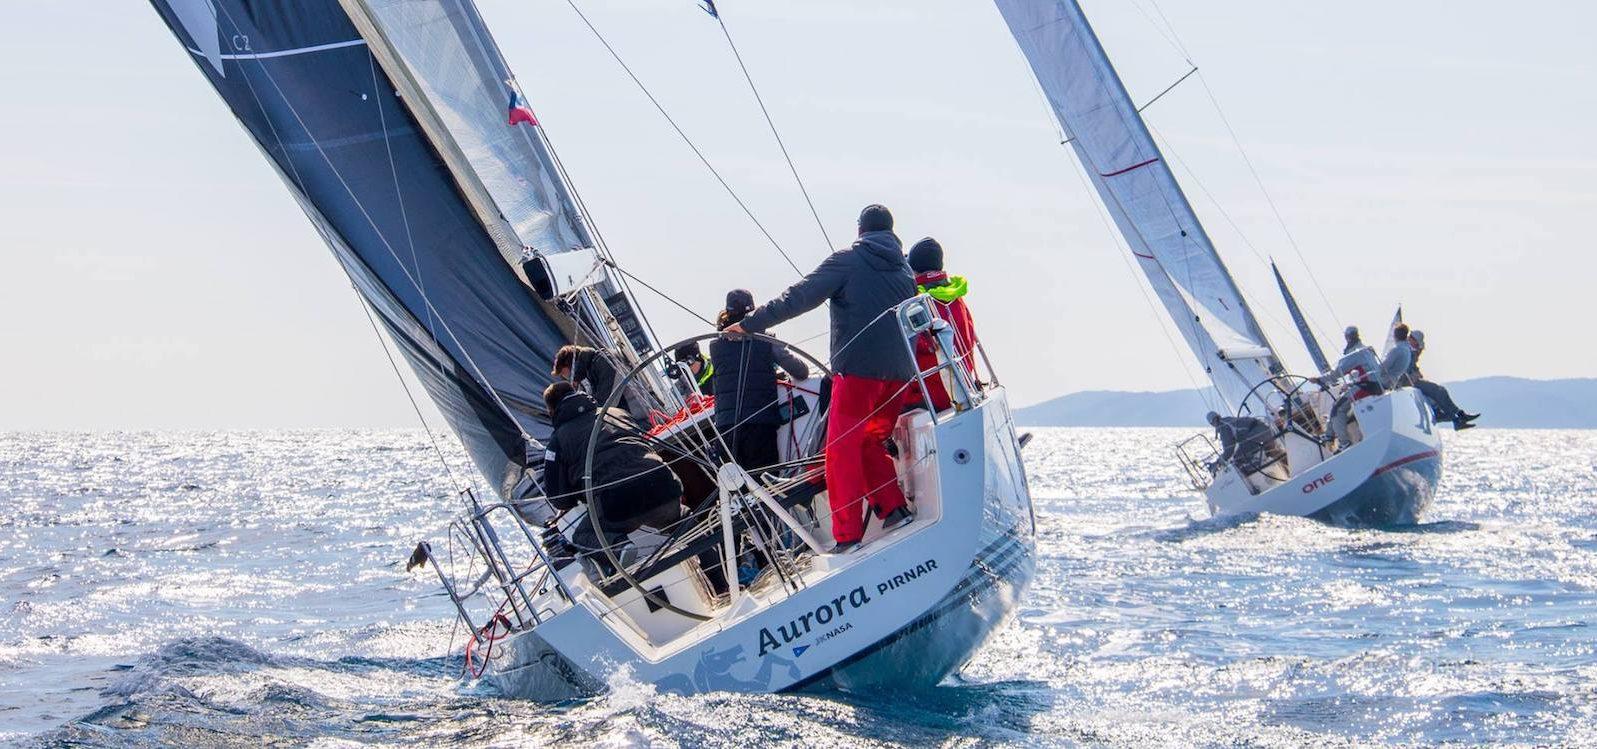 North Adriatic Sailing Academy